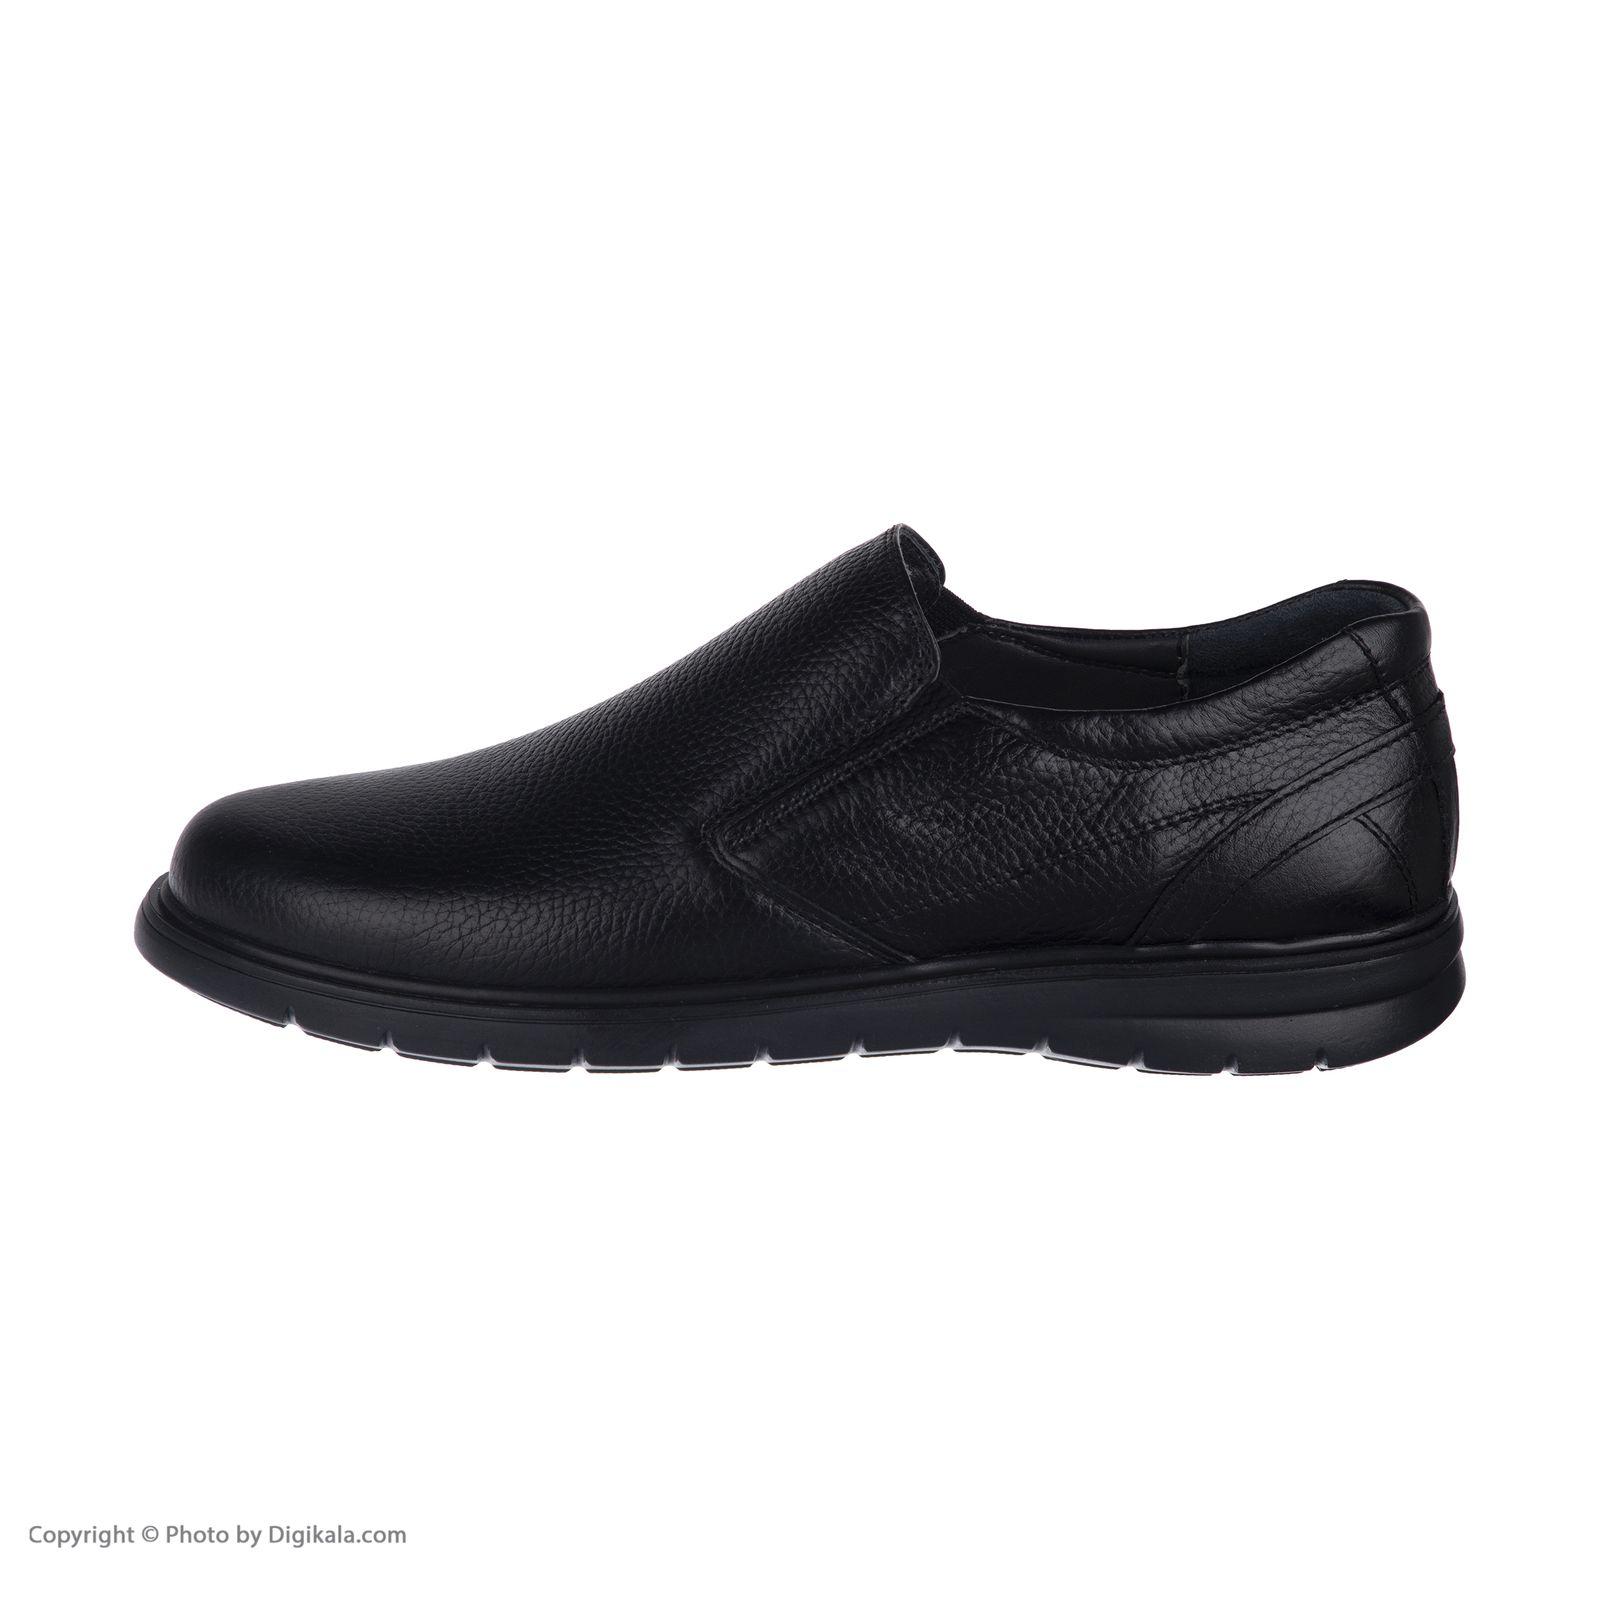 کفش روزمره مردانه دلفارد مدل 8334A503101 -  - 3